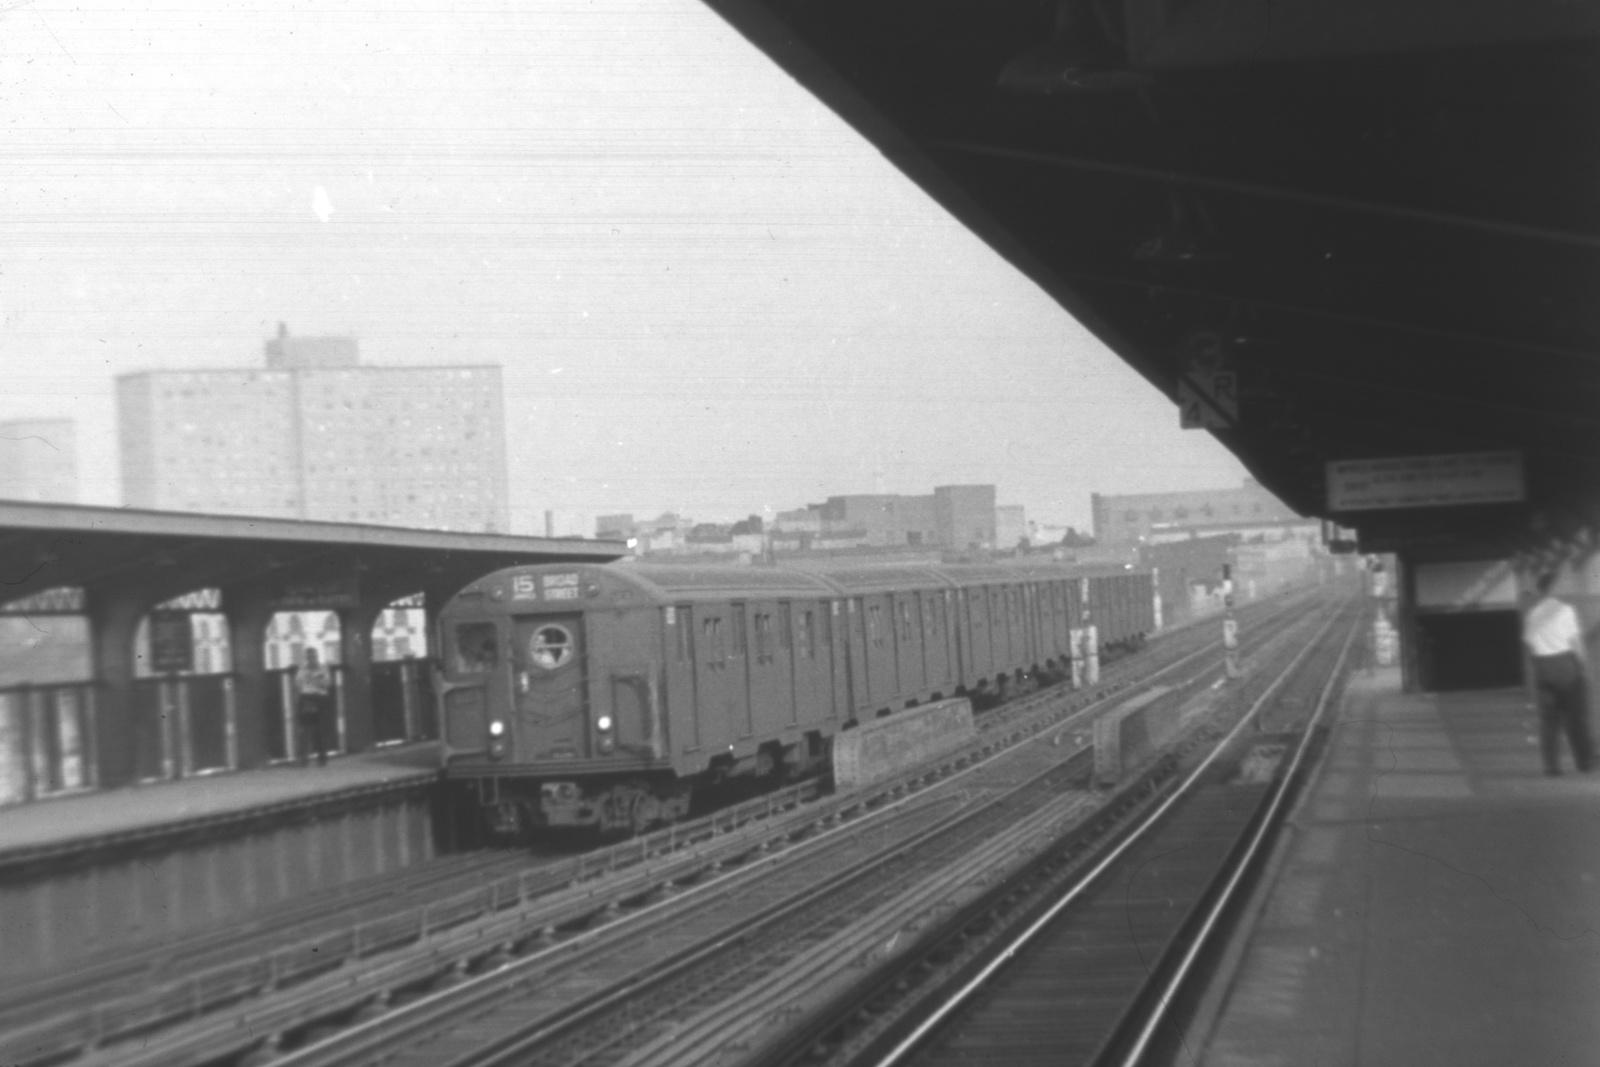 (315k, 1600x1067)<br><b>Country:</b> United States<br><b>City:</b> New York<br><b>System:</b> New York City Transit<br><b>Line:</b> BMT Nassau Street-Jamaica Line<br><b>Location:</b> Lorimer Street<br><b>Route:</b> BMT 15<br><b>Car:</b> R-16 (American Car & Foundry, 1955)  <br><b>Collection of:</b> David Pirmann<br><b>Viewed (this week/total):</b> 3 / 230